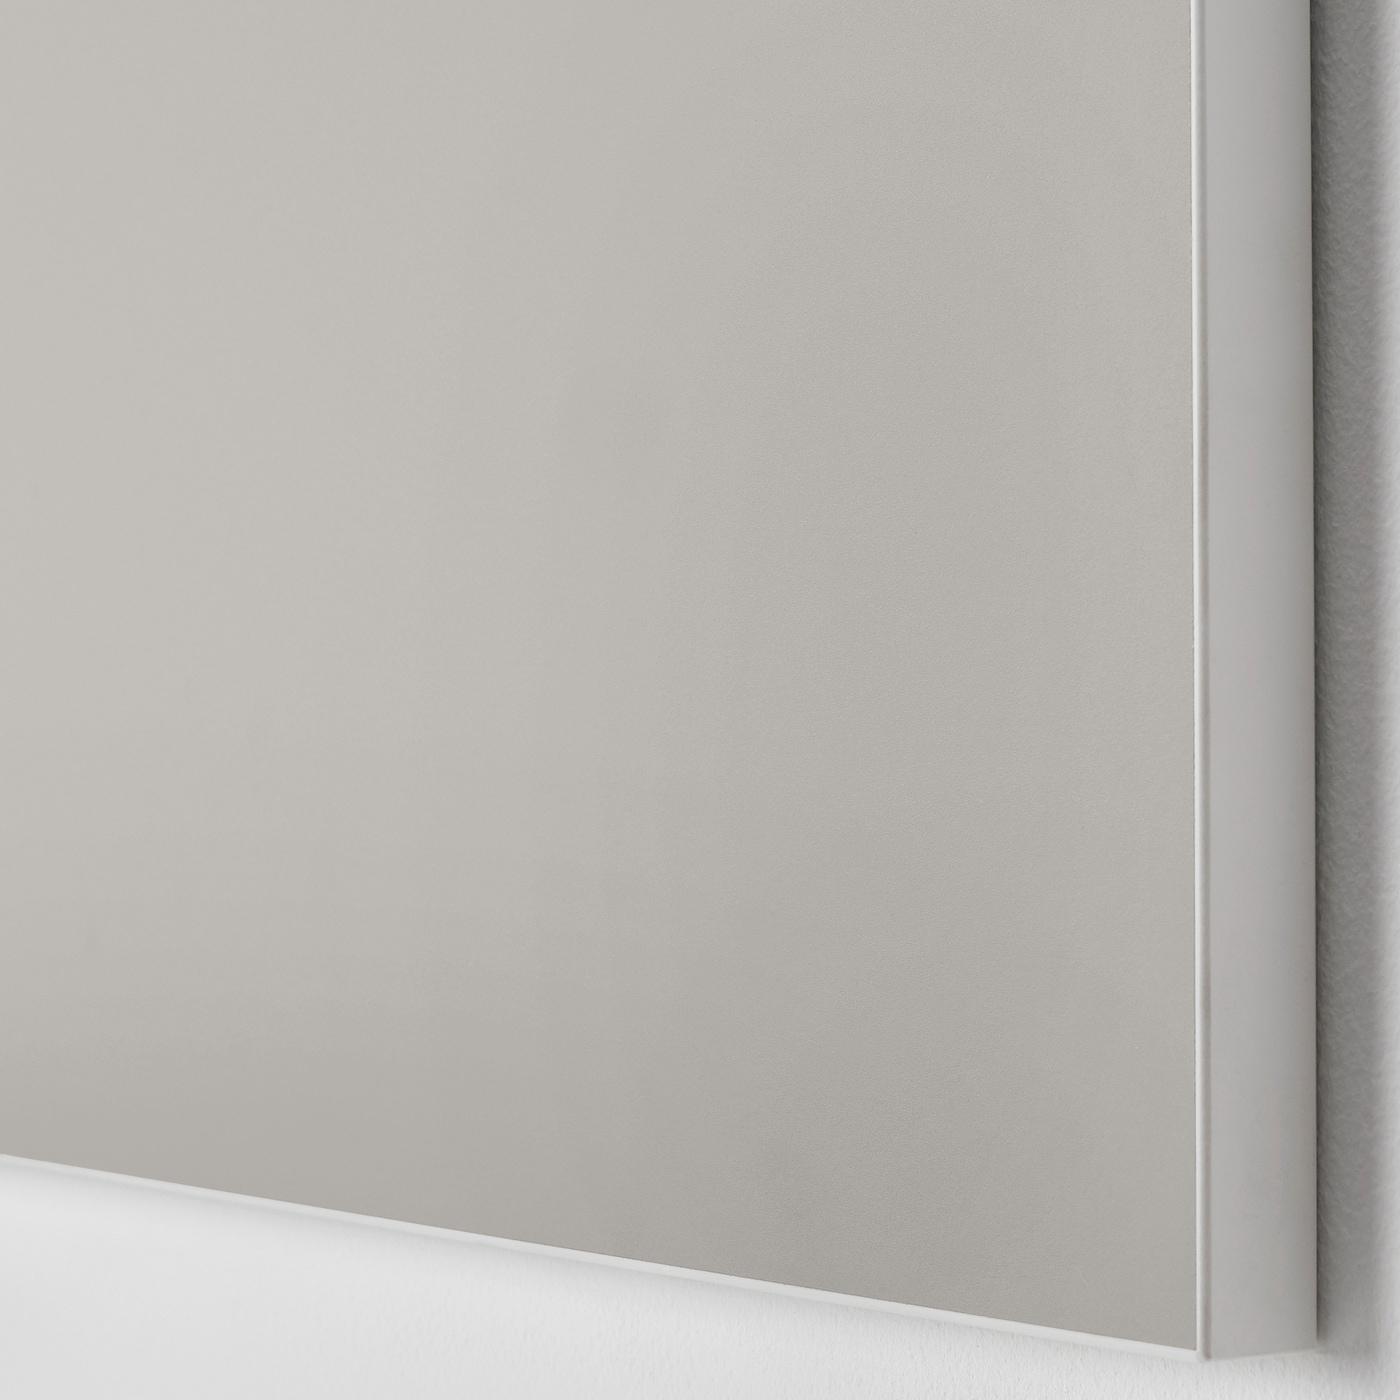 SKATVAL Dörr, ljusgrå, 60x180 cm